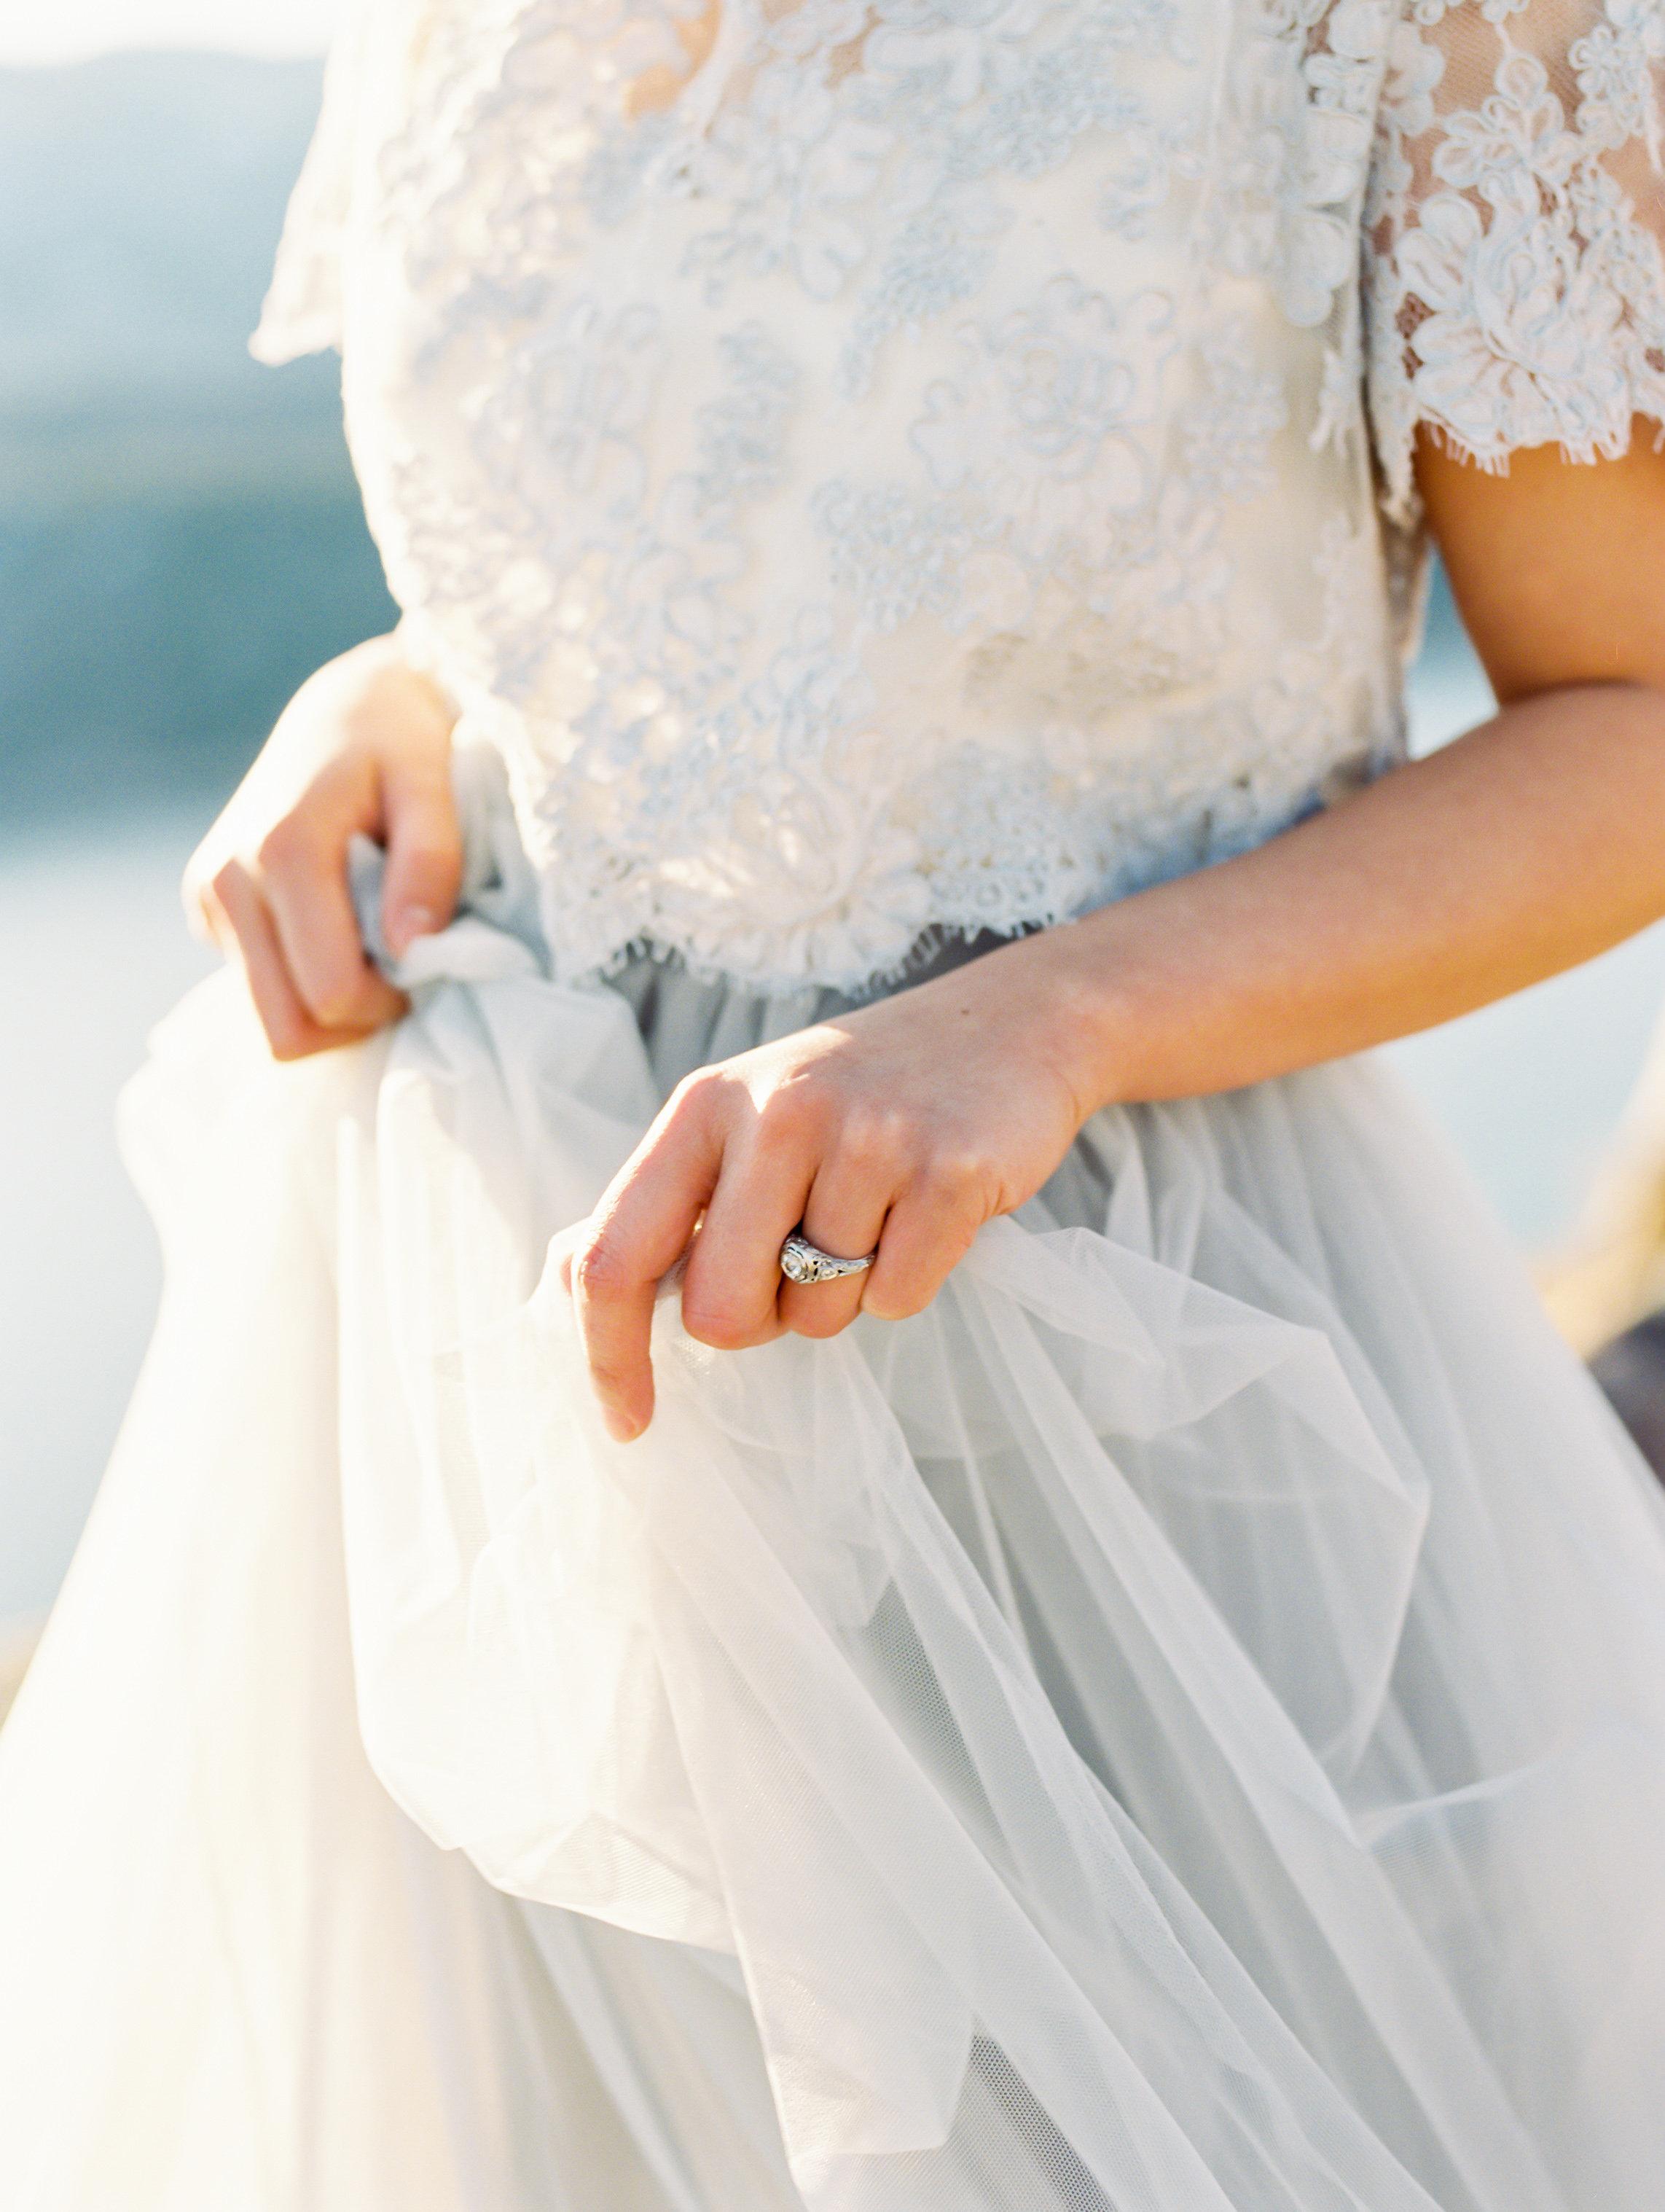 Cliffside-Elopement-Destination-Wedding-Magnolia-Rouge79.jpg